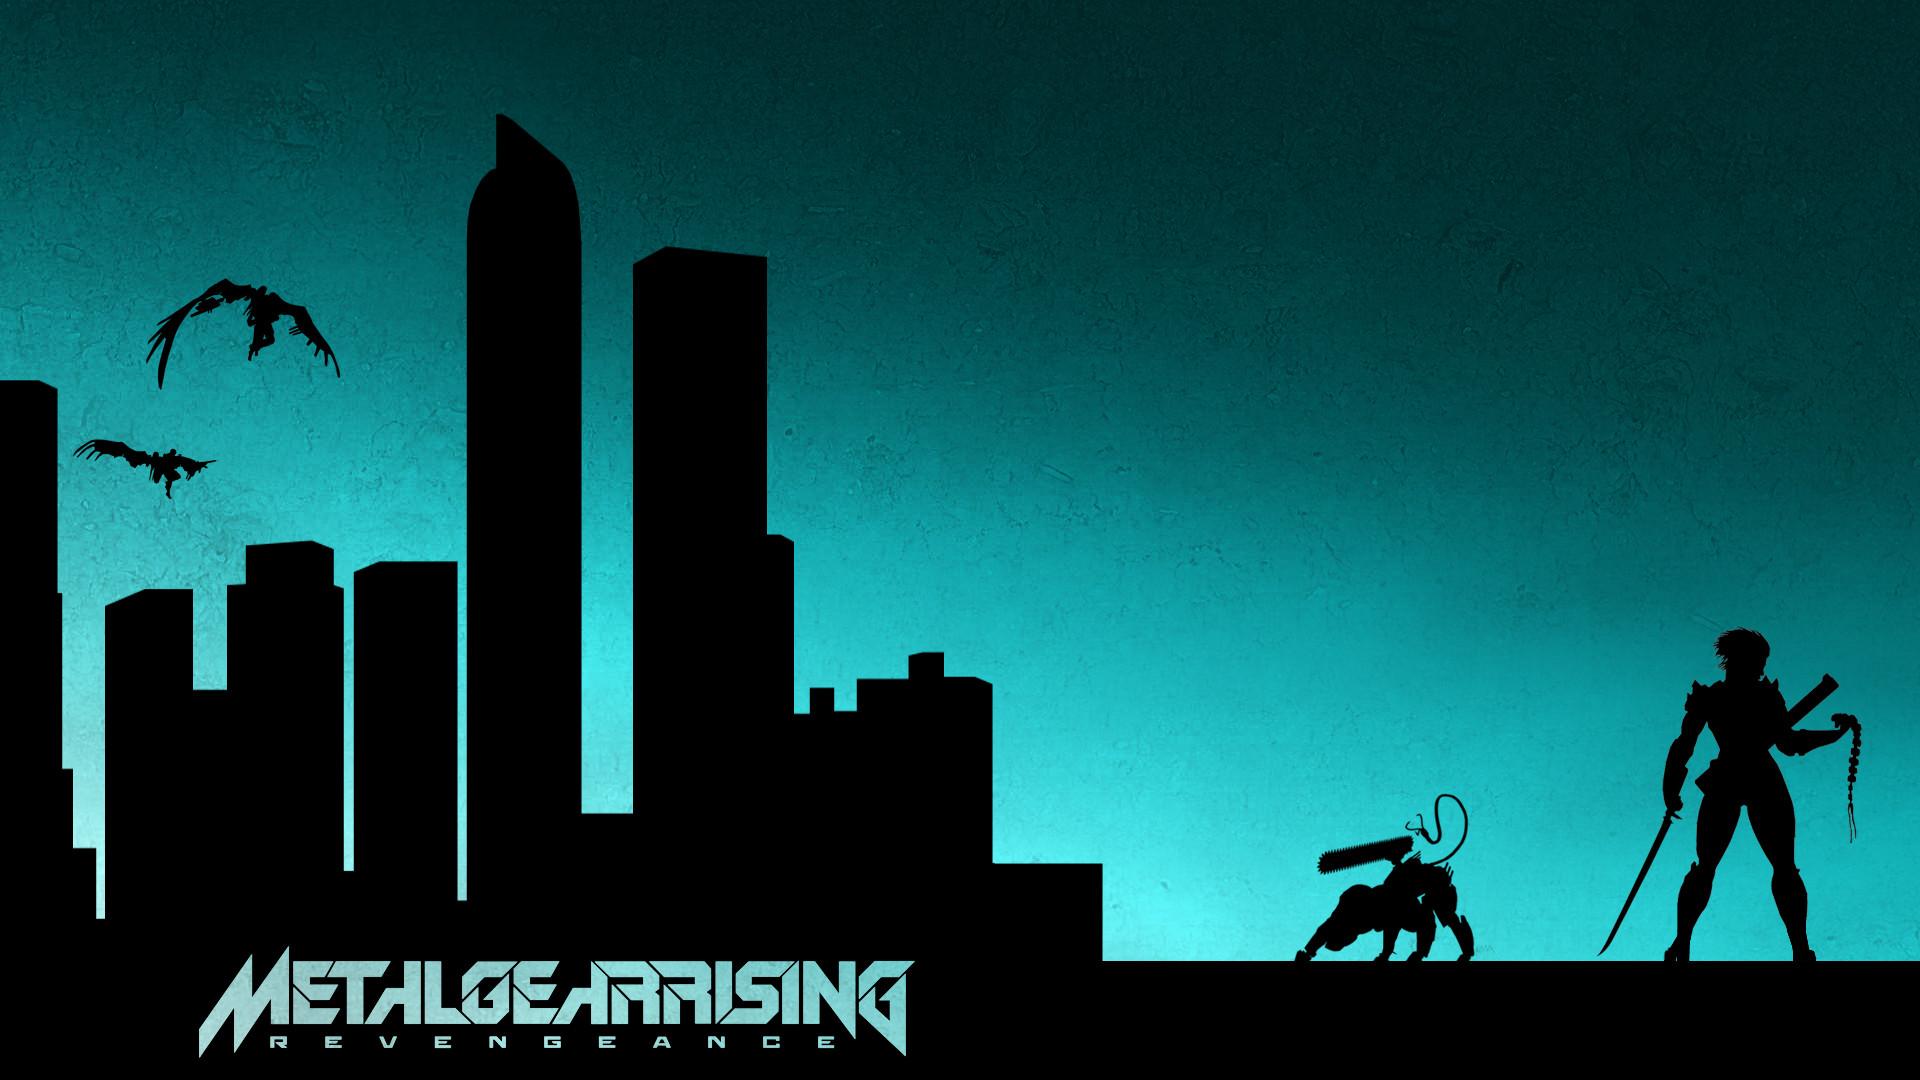 Video Game – Metal Gear Rising: Revengeance Wallpaper